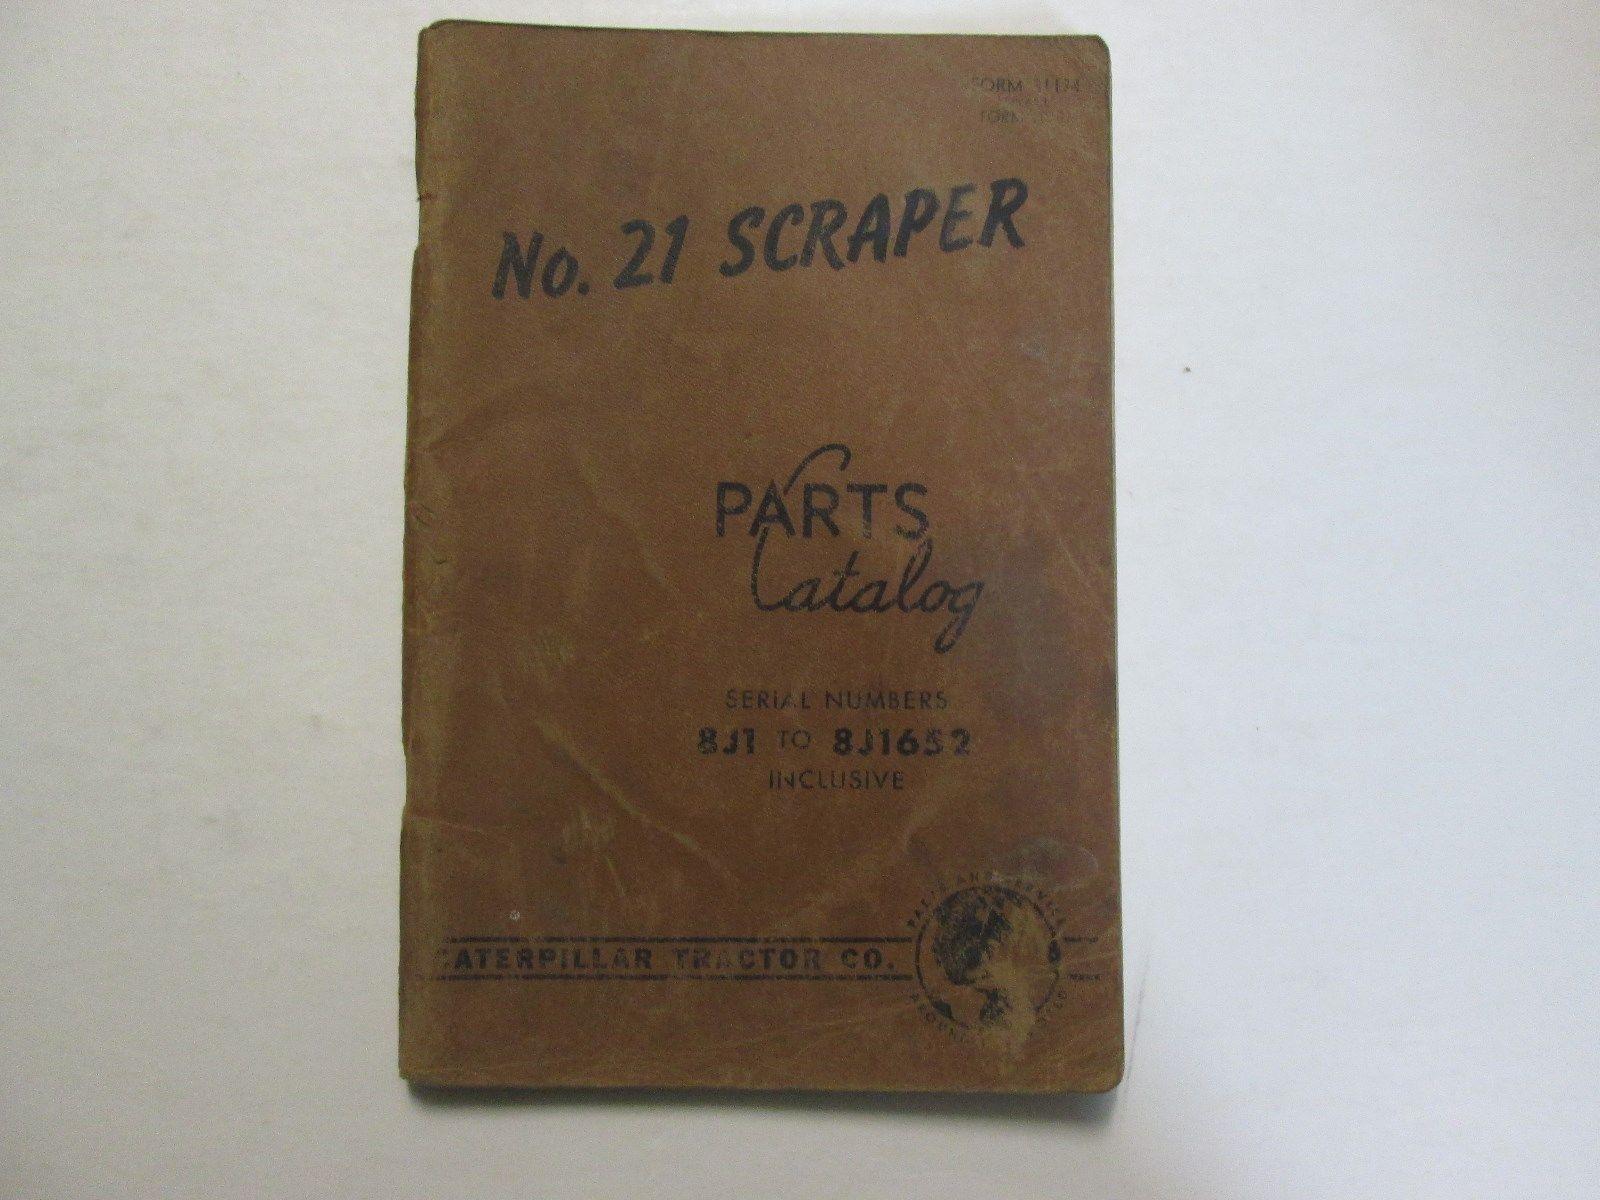 Caterpillar No 21 Scraper Parts Catalog 8J1 To 8J1652 USED OEM CATERPILLAR